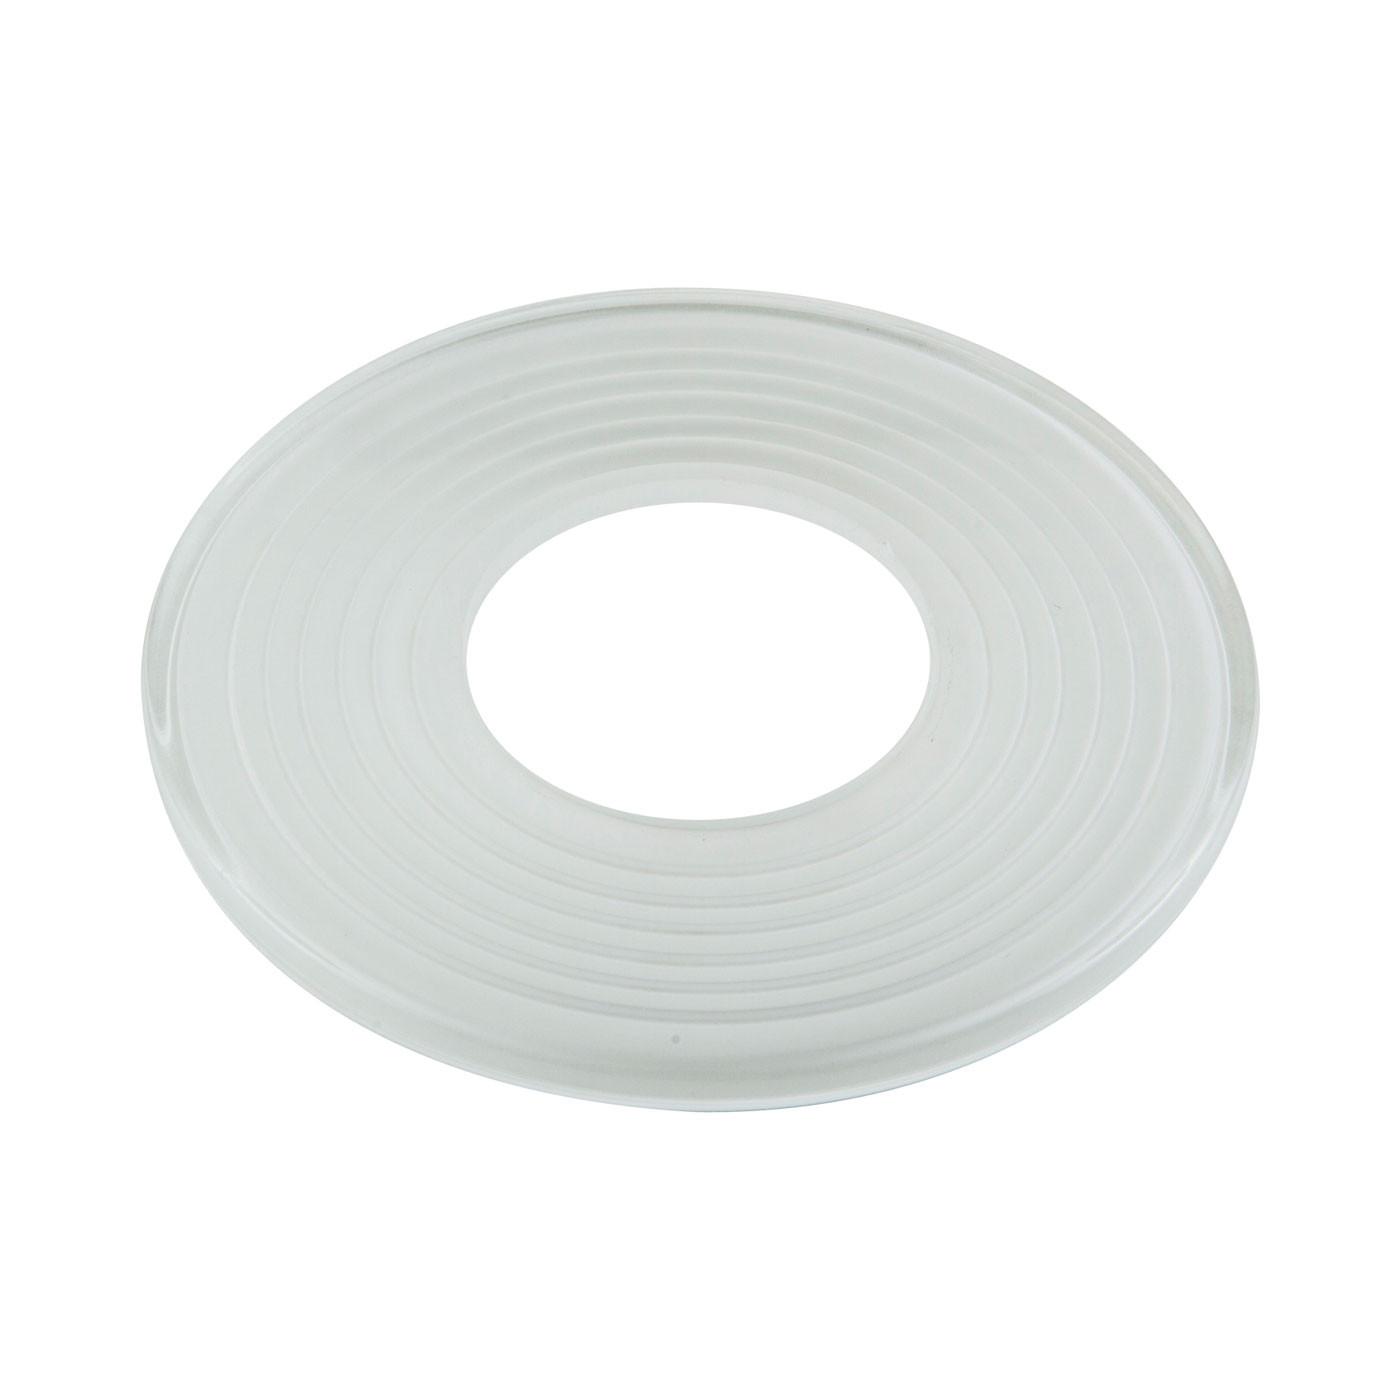 Flos Moni replacement glas ring